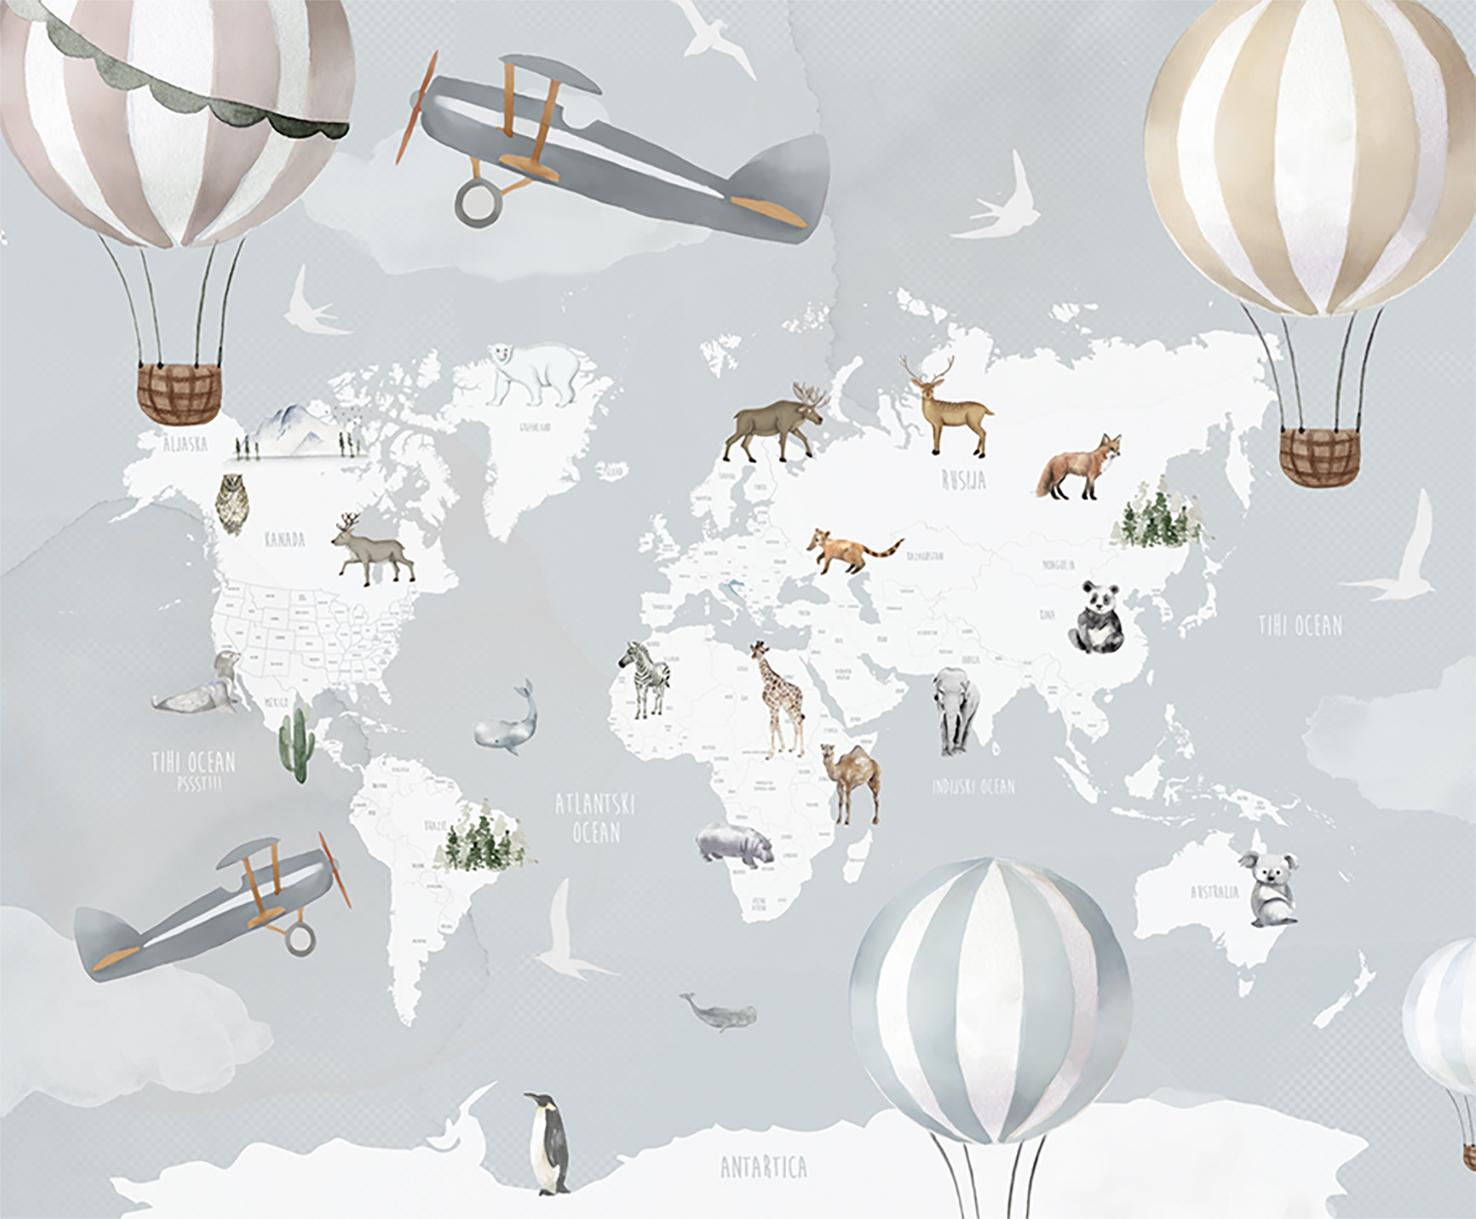 World_map_watercolors_wallpaper